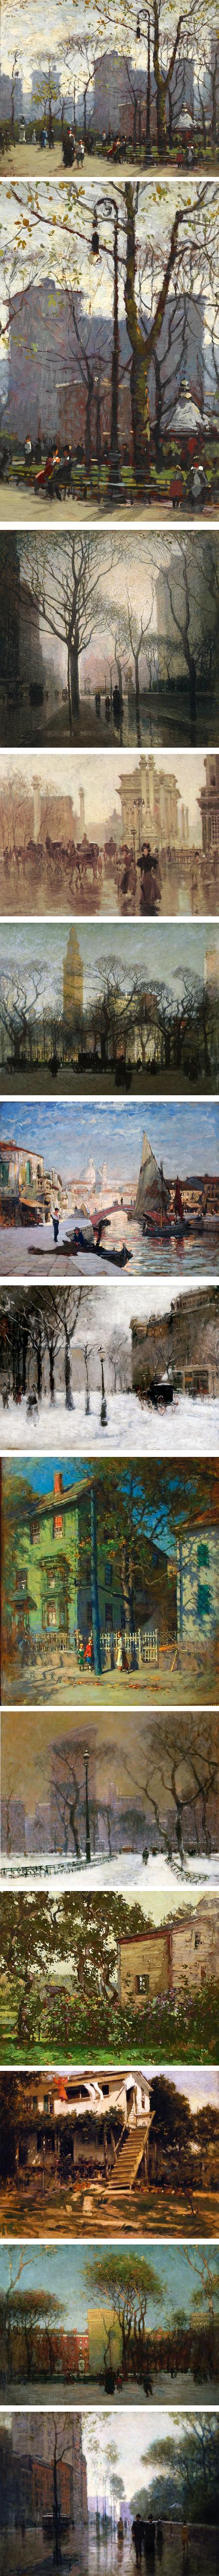 Paul Cornoyer, American Impressionist